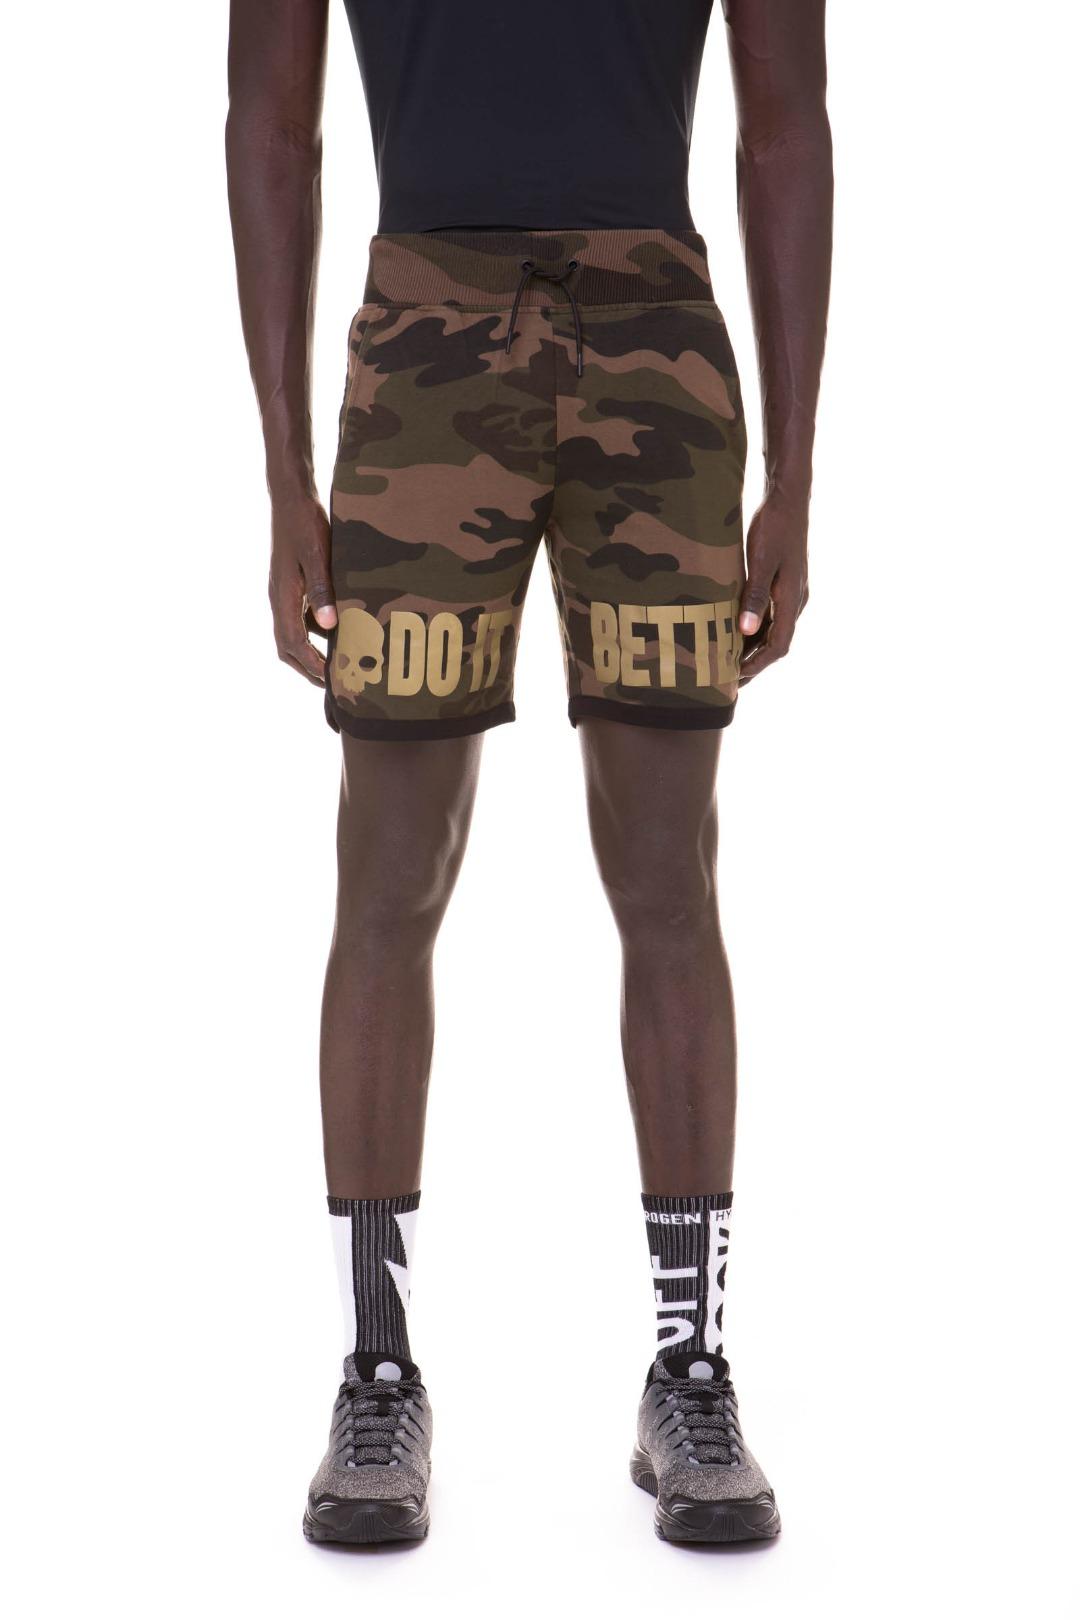 Hydrogen Shorts Do It Better Cmo Militare Uomo 1